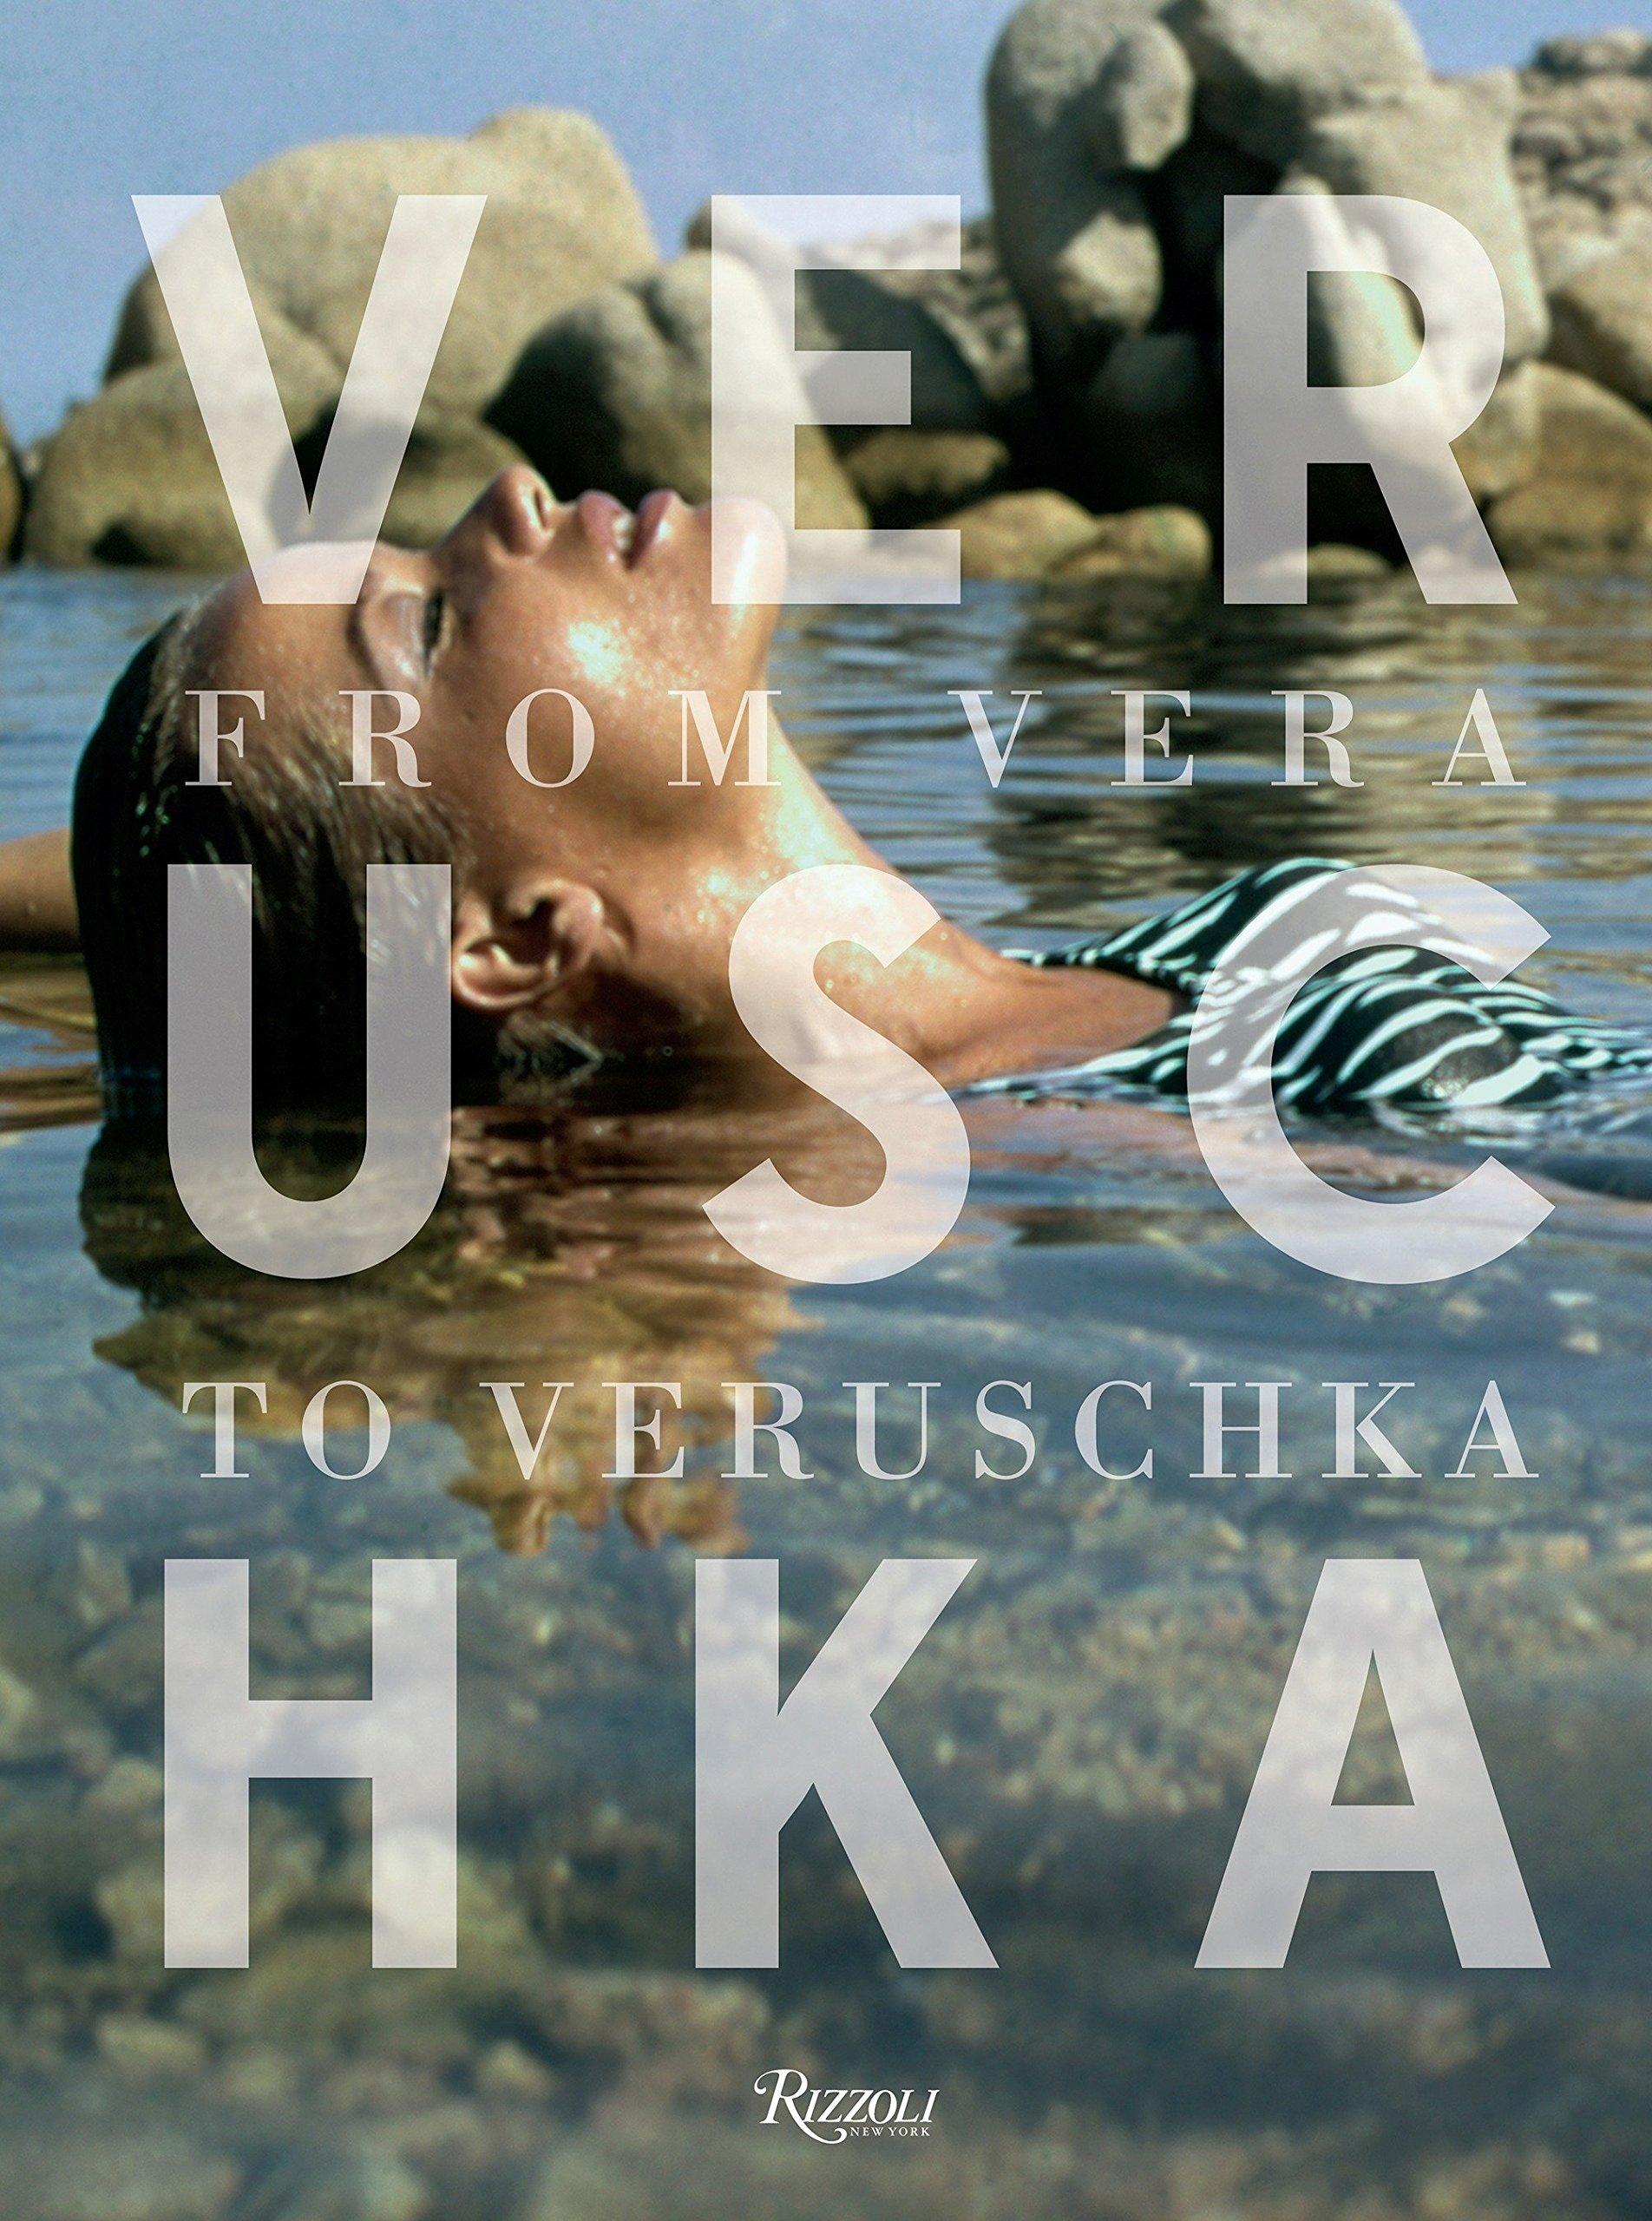 Read Online Veruschka: From Vera to Veruschka PDF